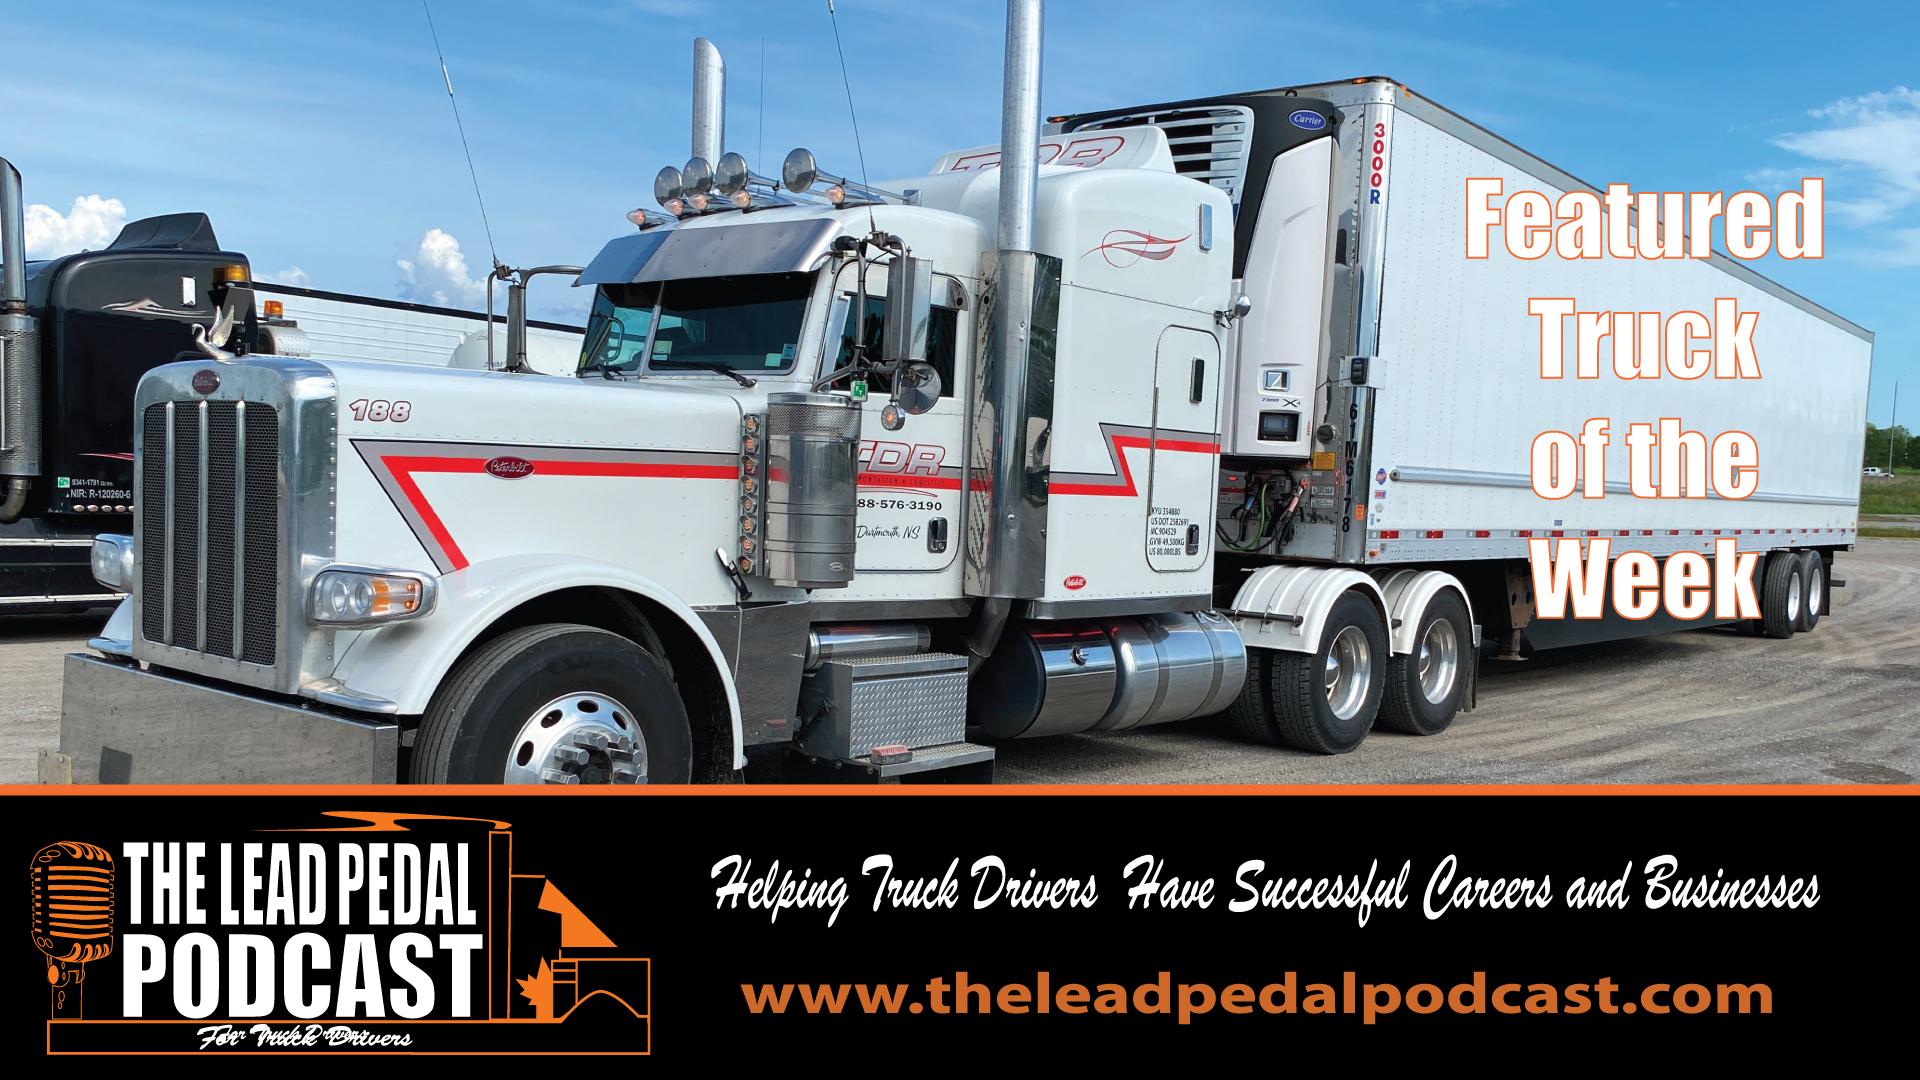 TDR-Featured Truck